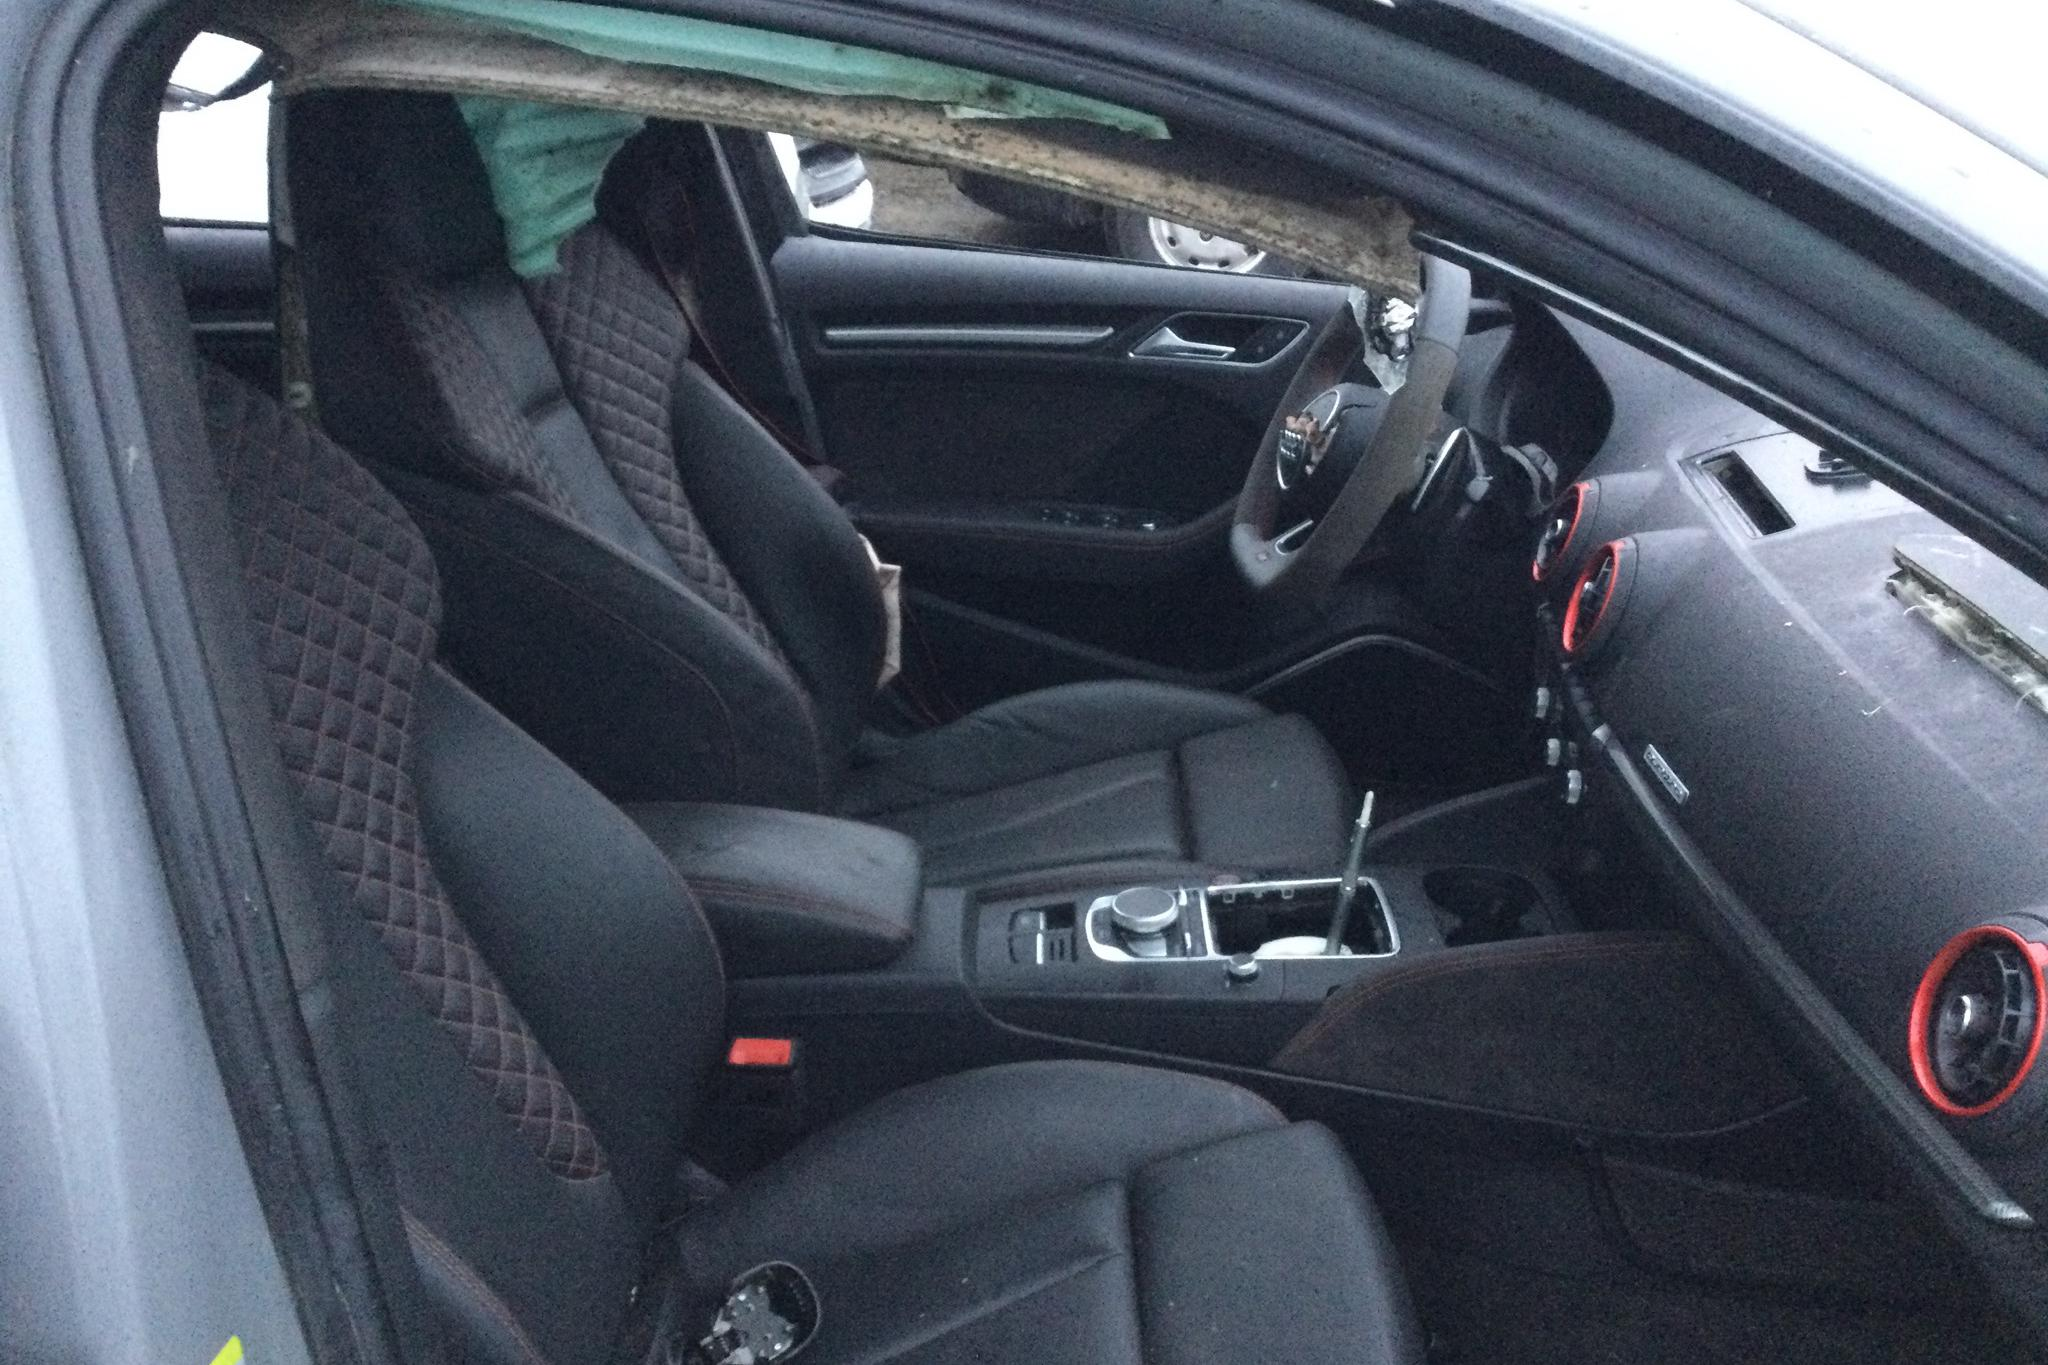 Audi RS3 2.5 TFSI Sportback quattro (400hk) - 1 300 mil - Automat - grå - 2018